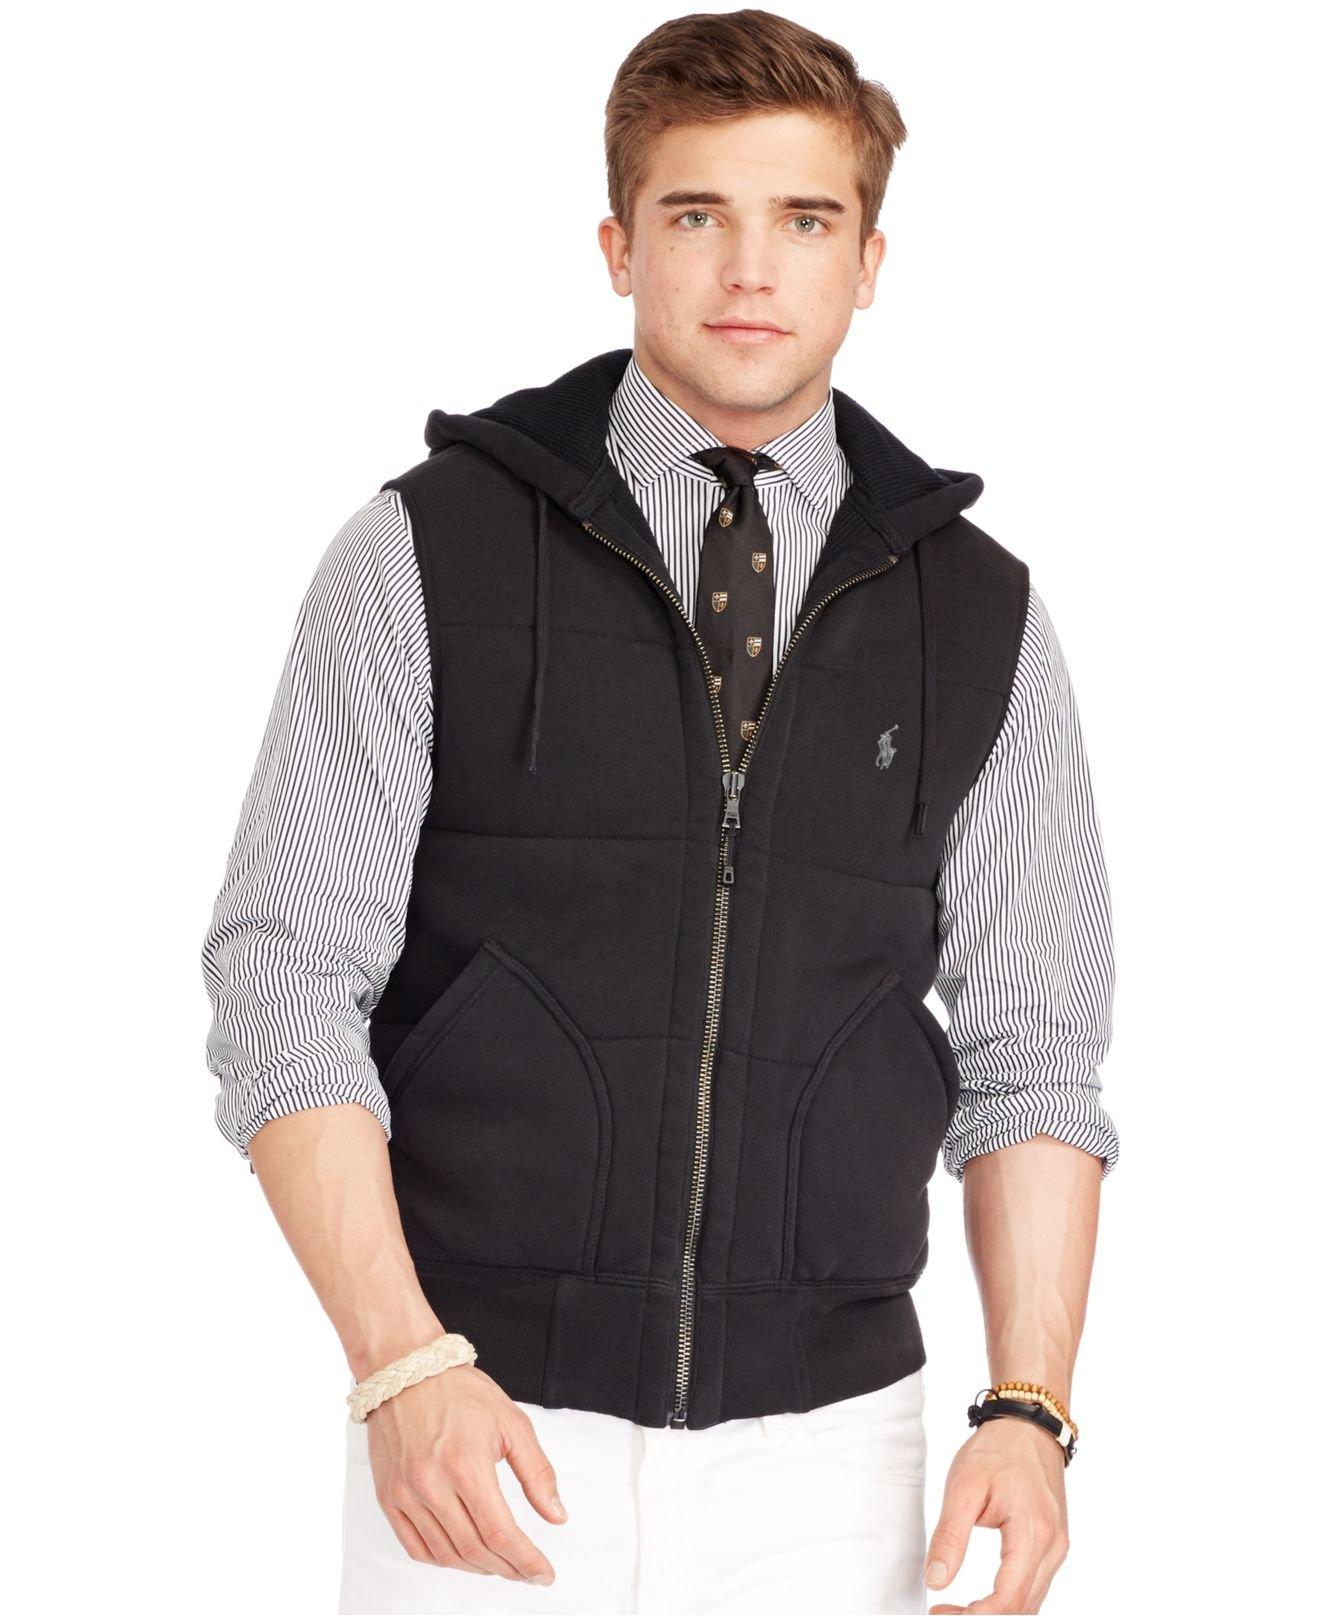 For Black Men Fleece Quilted Vest Polo Lauren Ralph A5qS4RL3jc